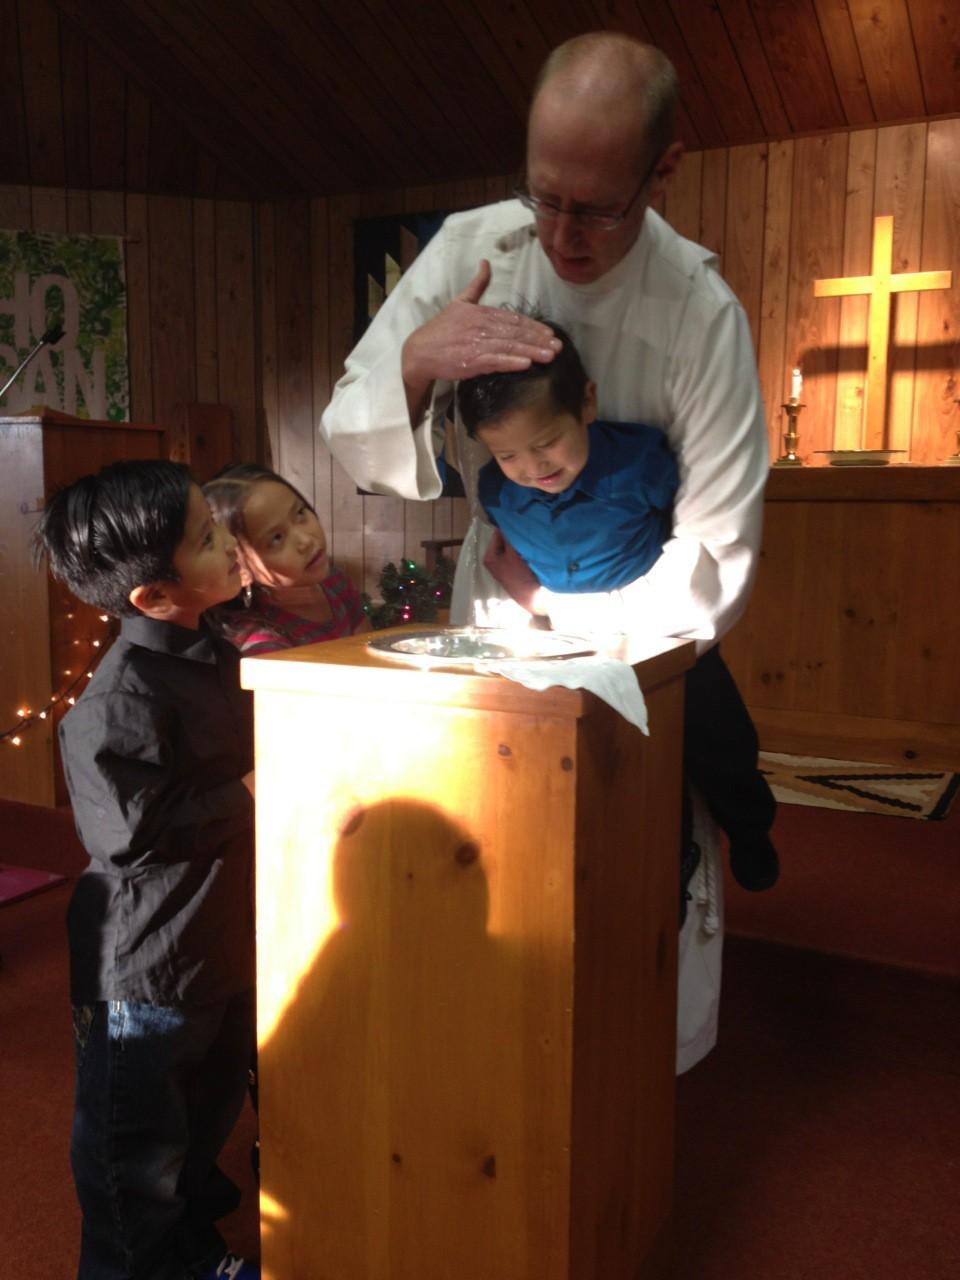 child being baptized